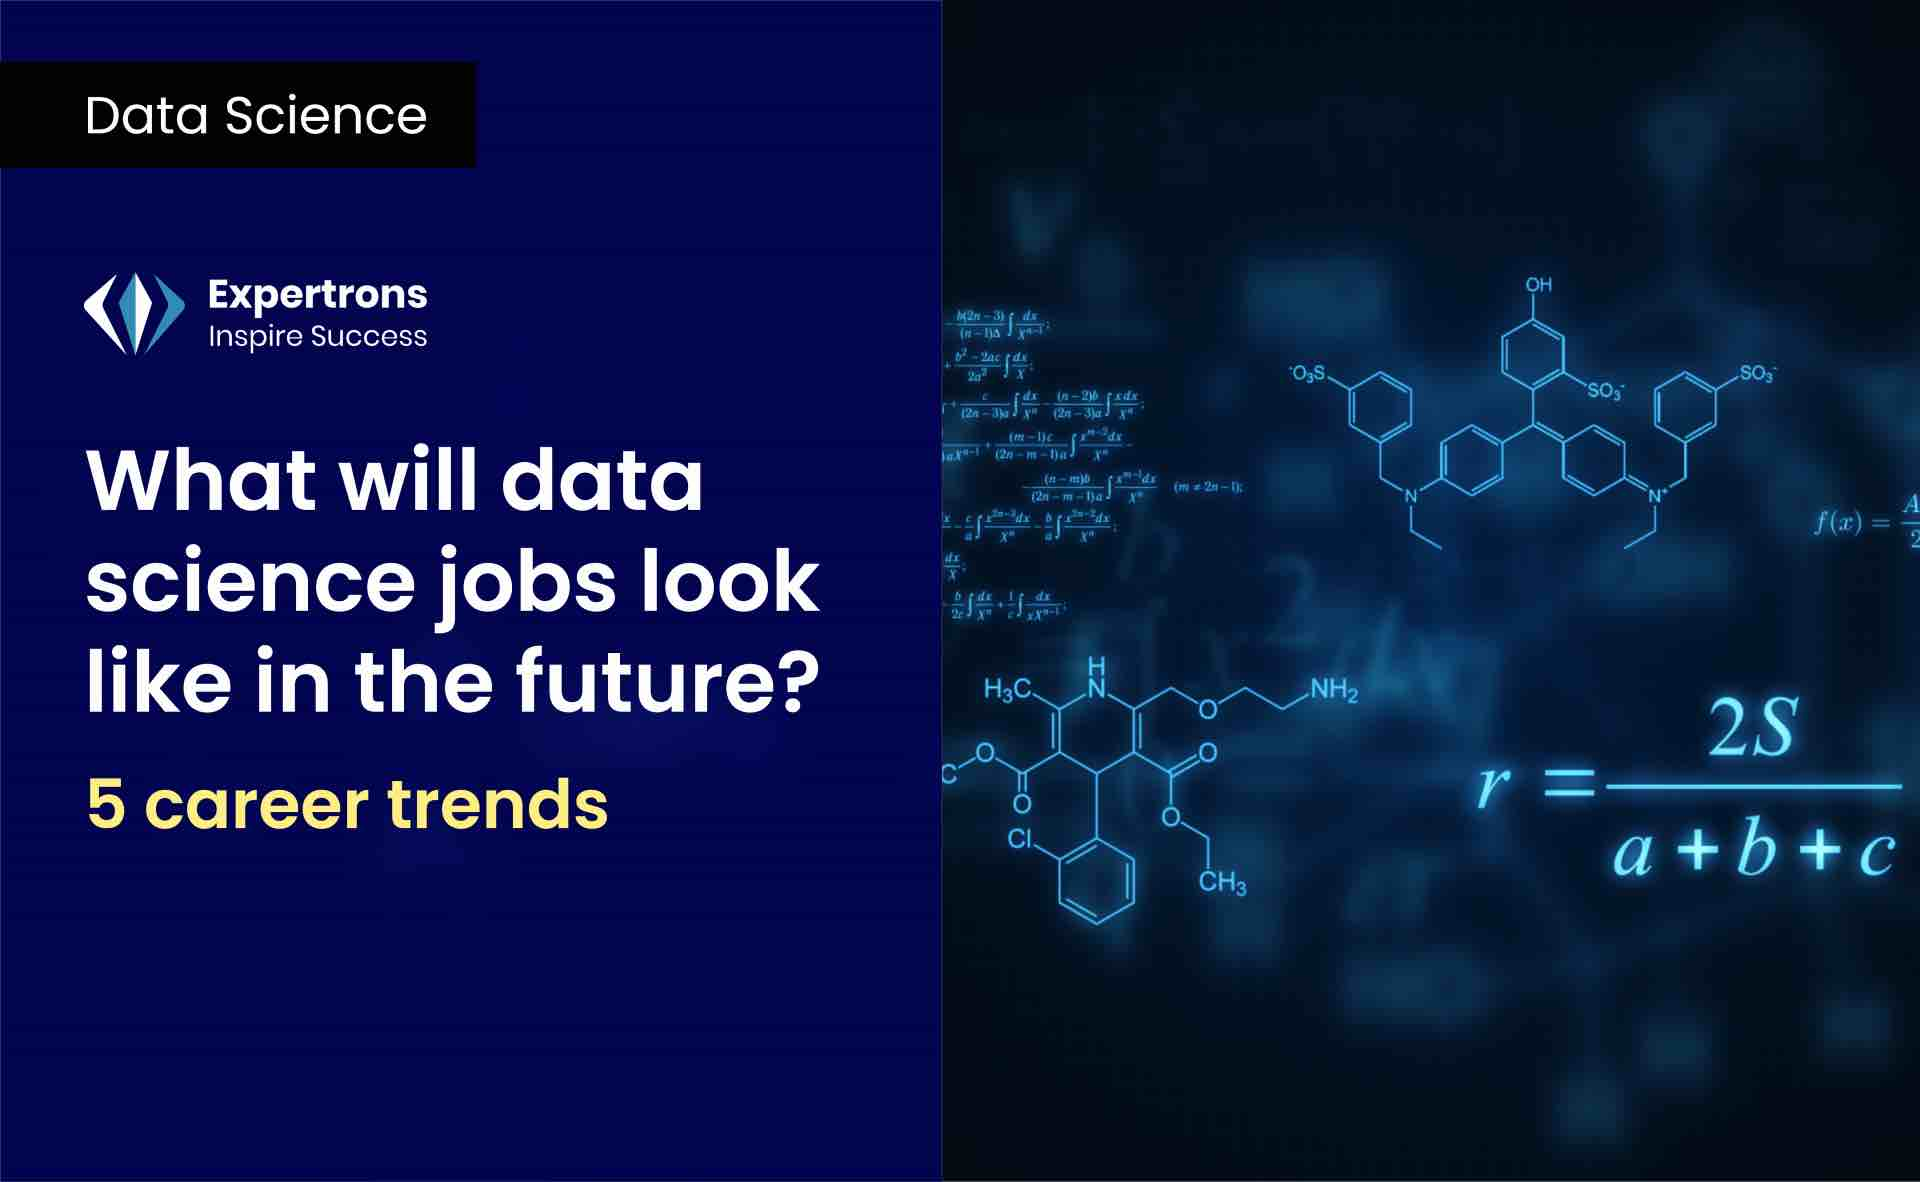 Data science, data analytics, data science jobs